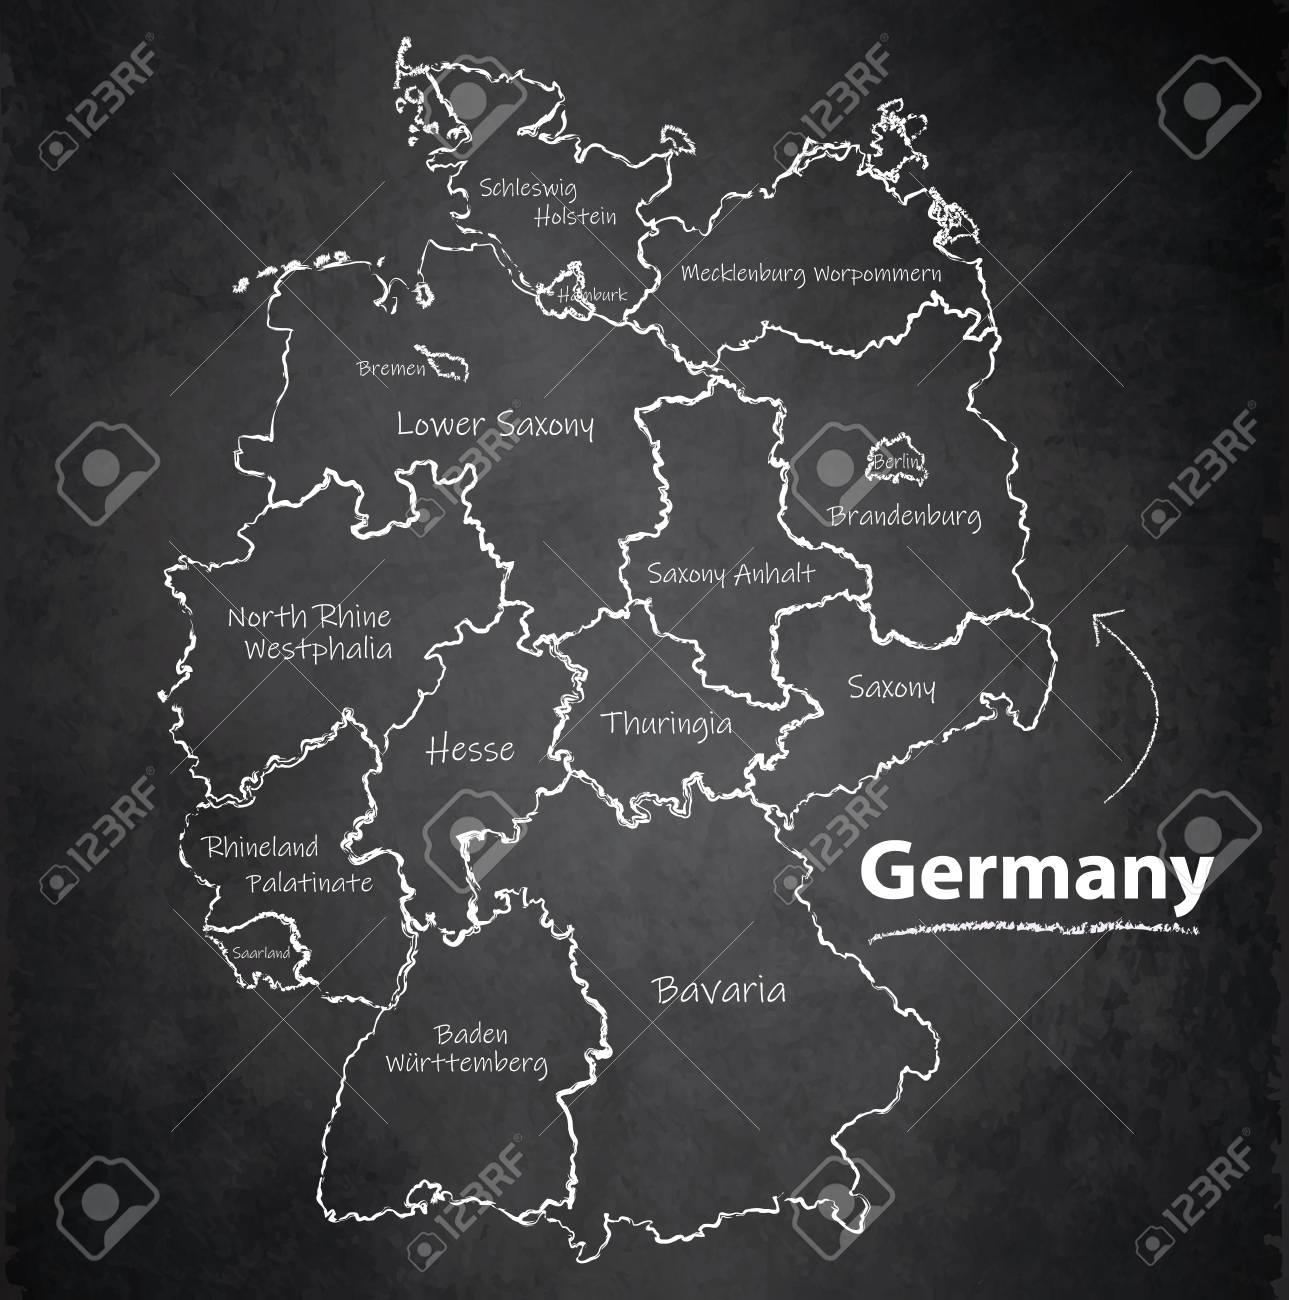 Germany map separate region individual names blackboard chalkboard vector - 104937228